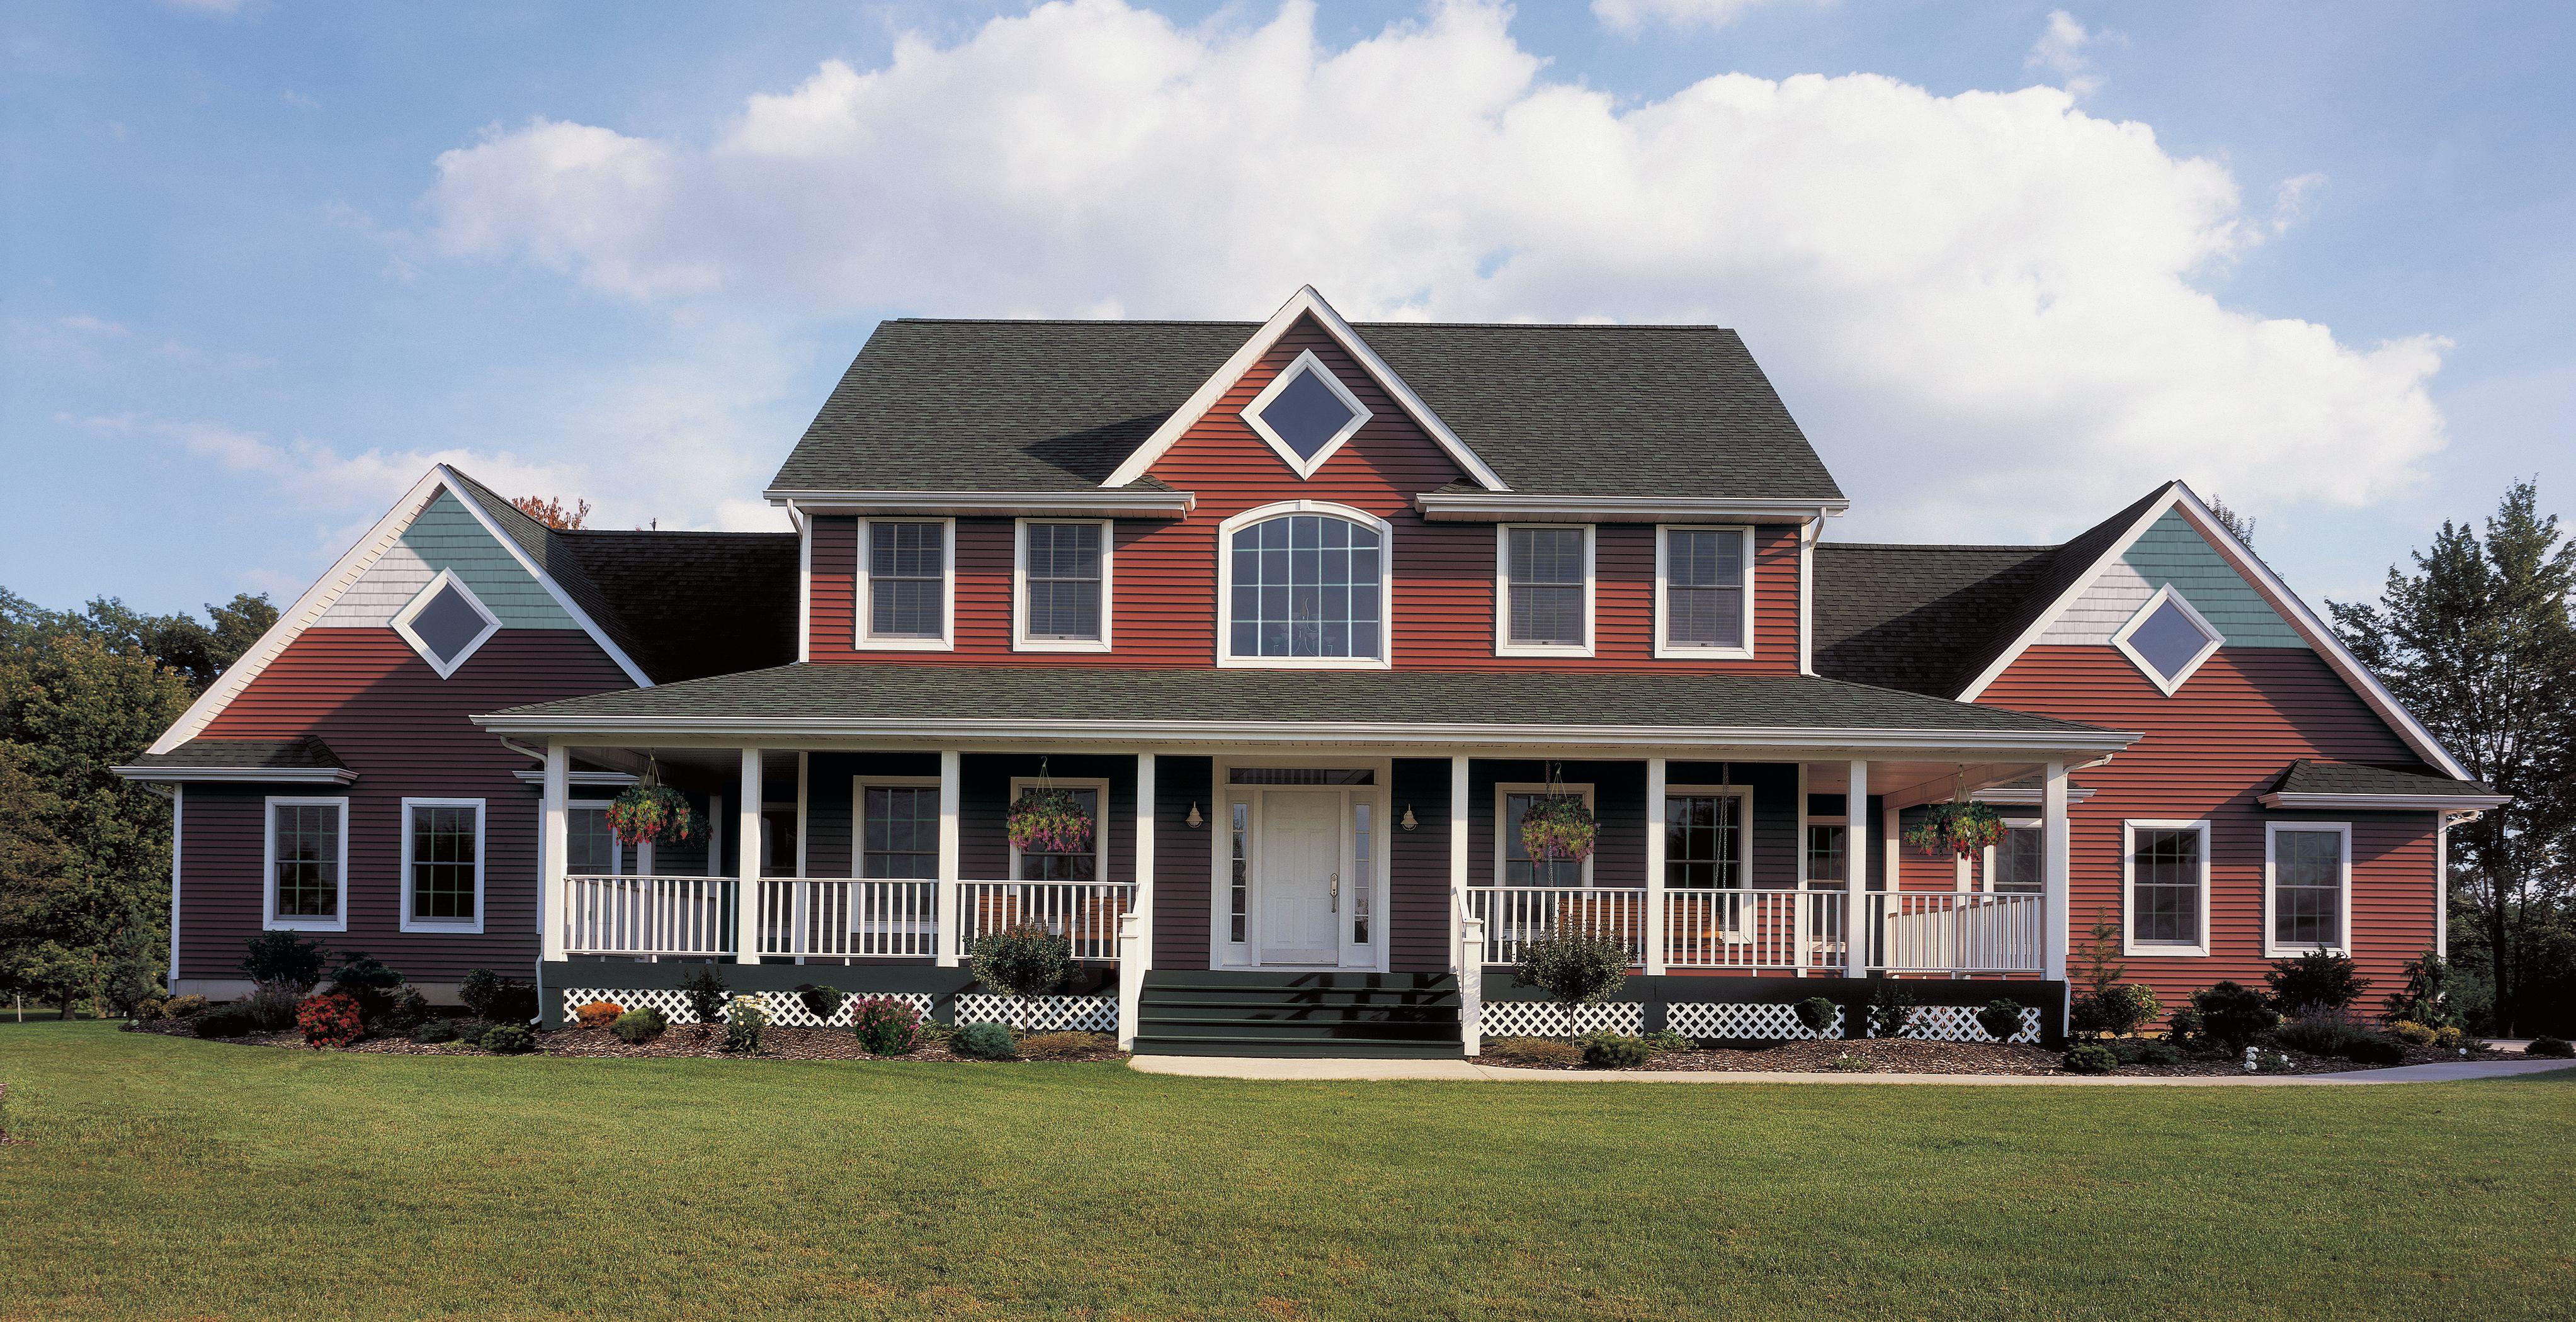 Certainteed Siding Monogram Barn Red House Paint Design House Paint Exterior House Designs Exterior